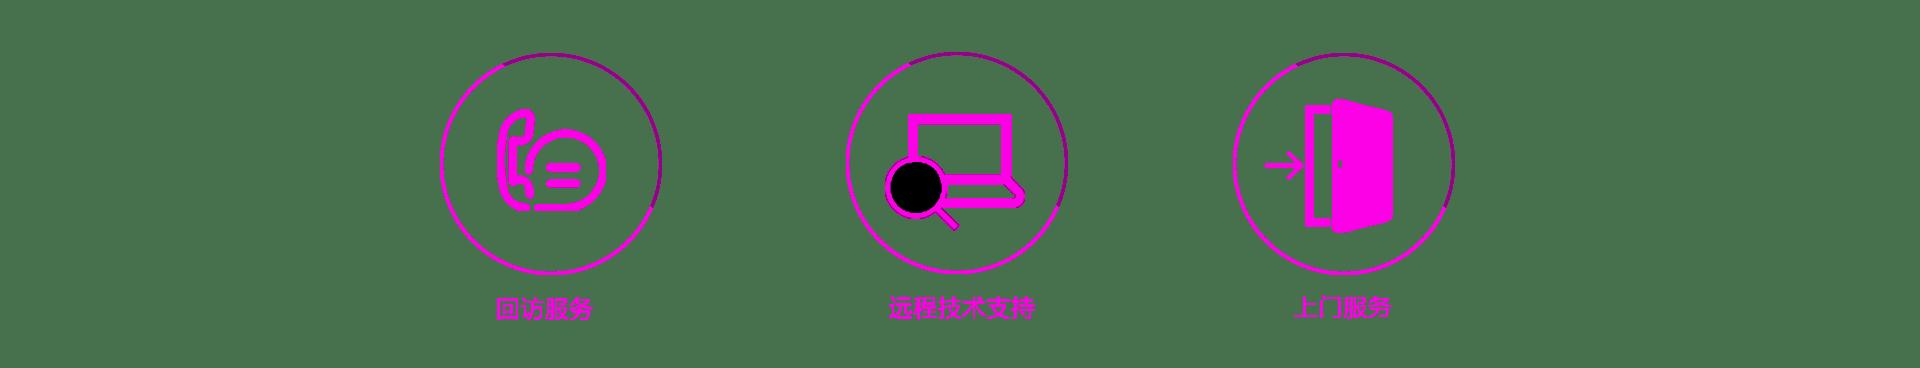 msi-2020微星大客戶7項服务专享优惠